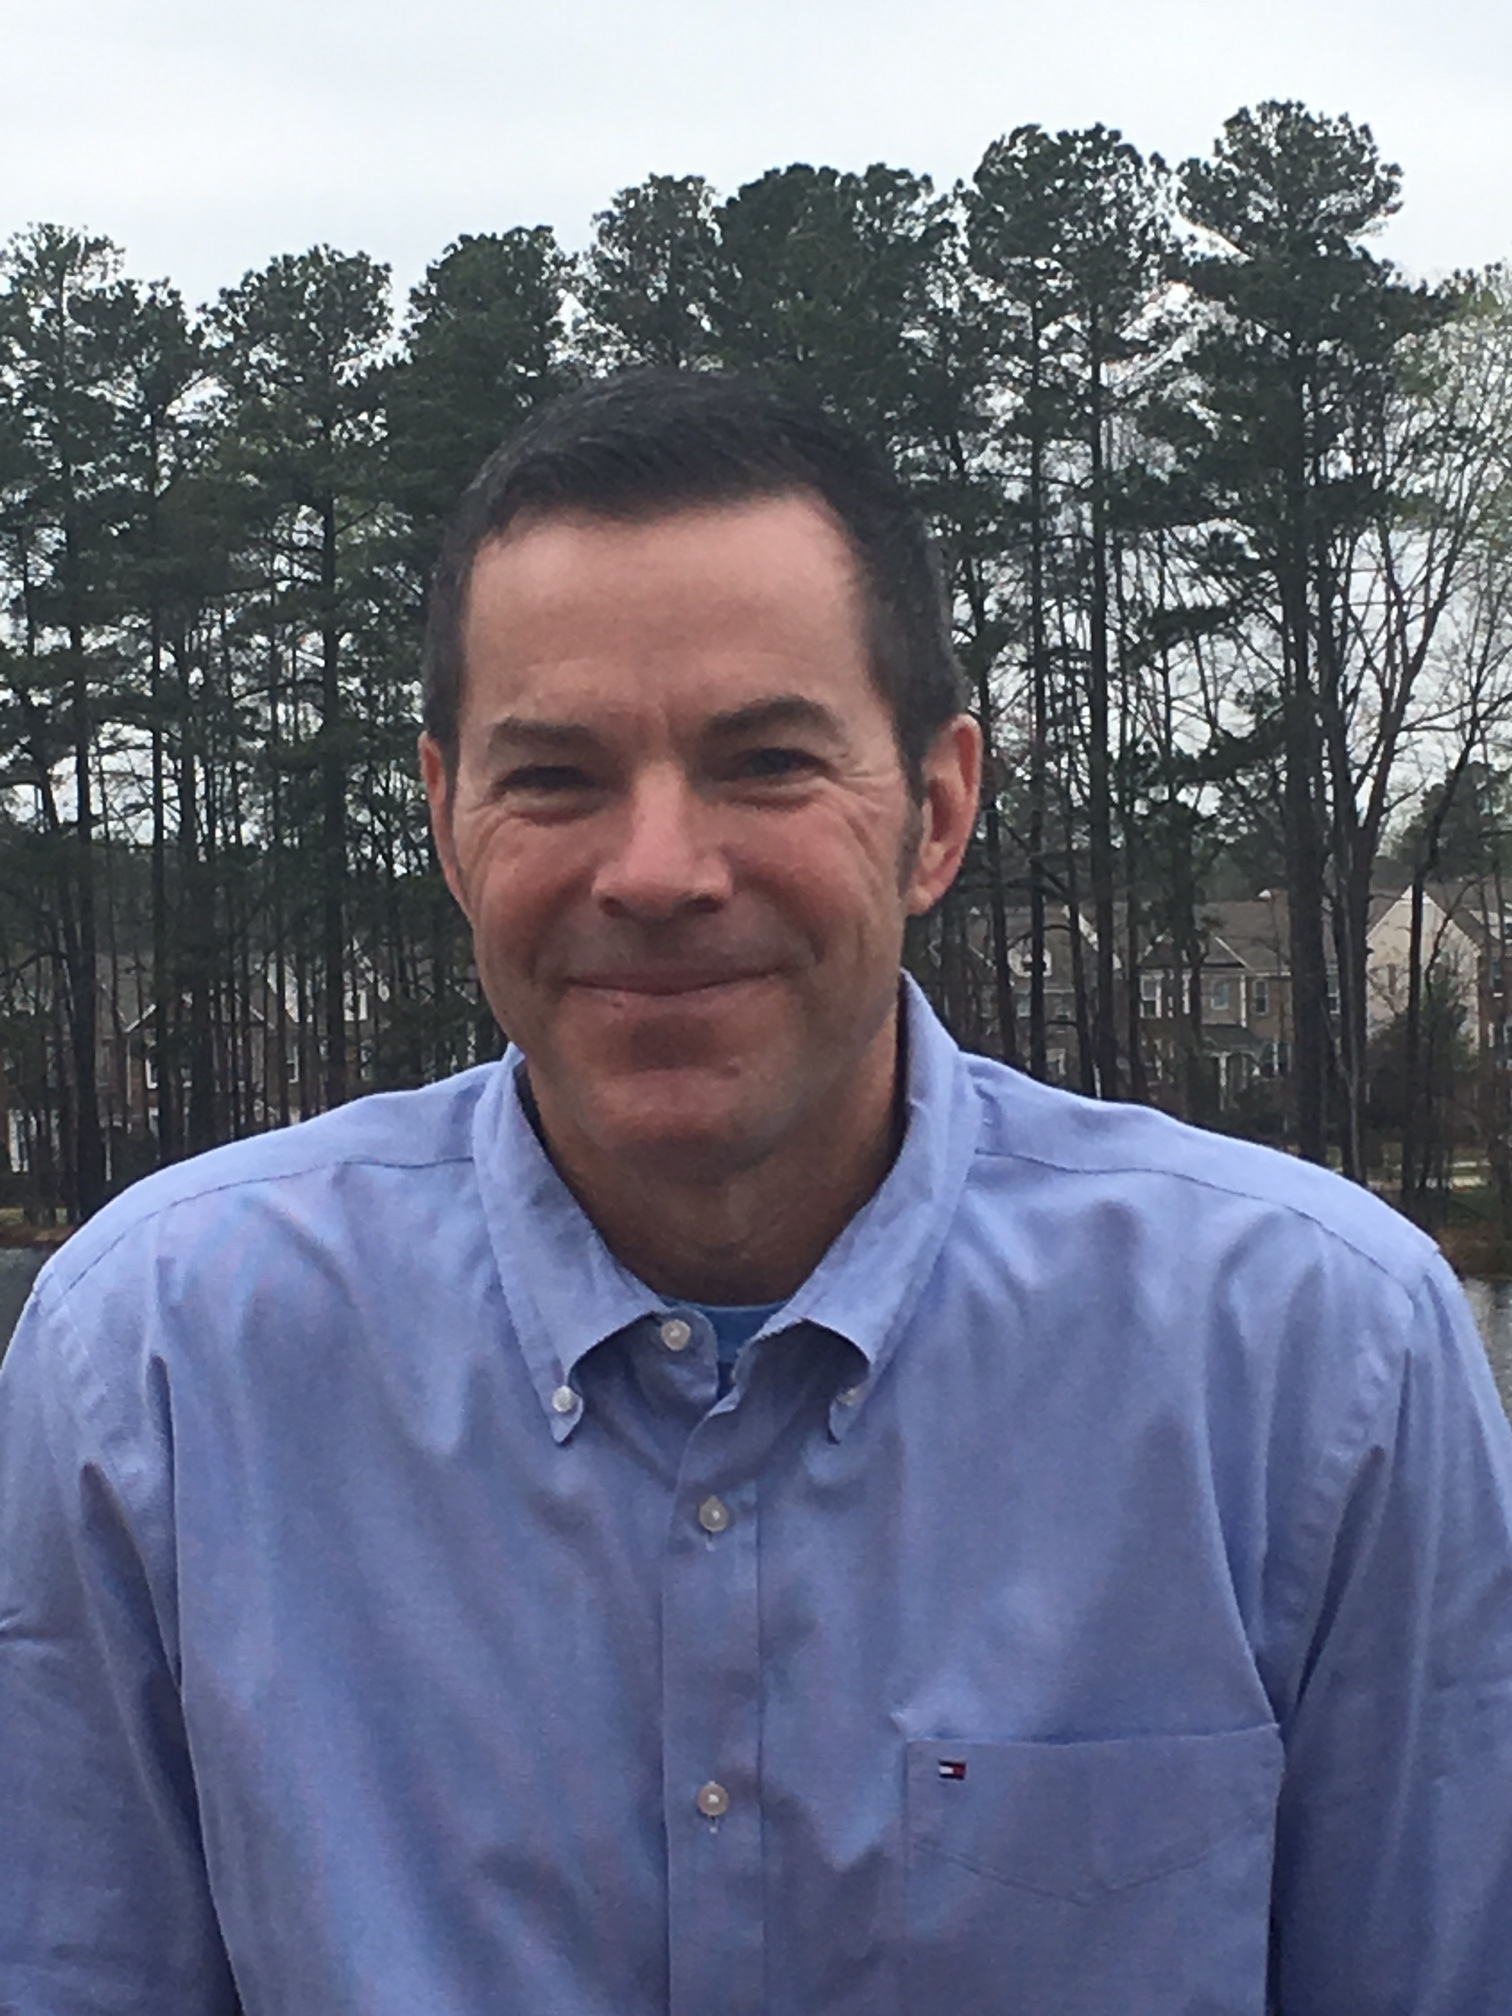 Steve M, Raleigh-Durham-Cary